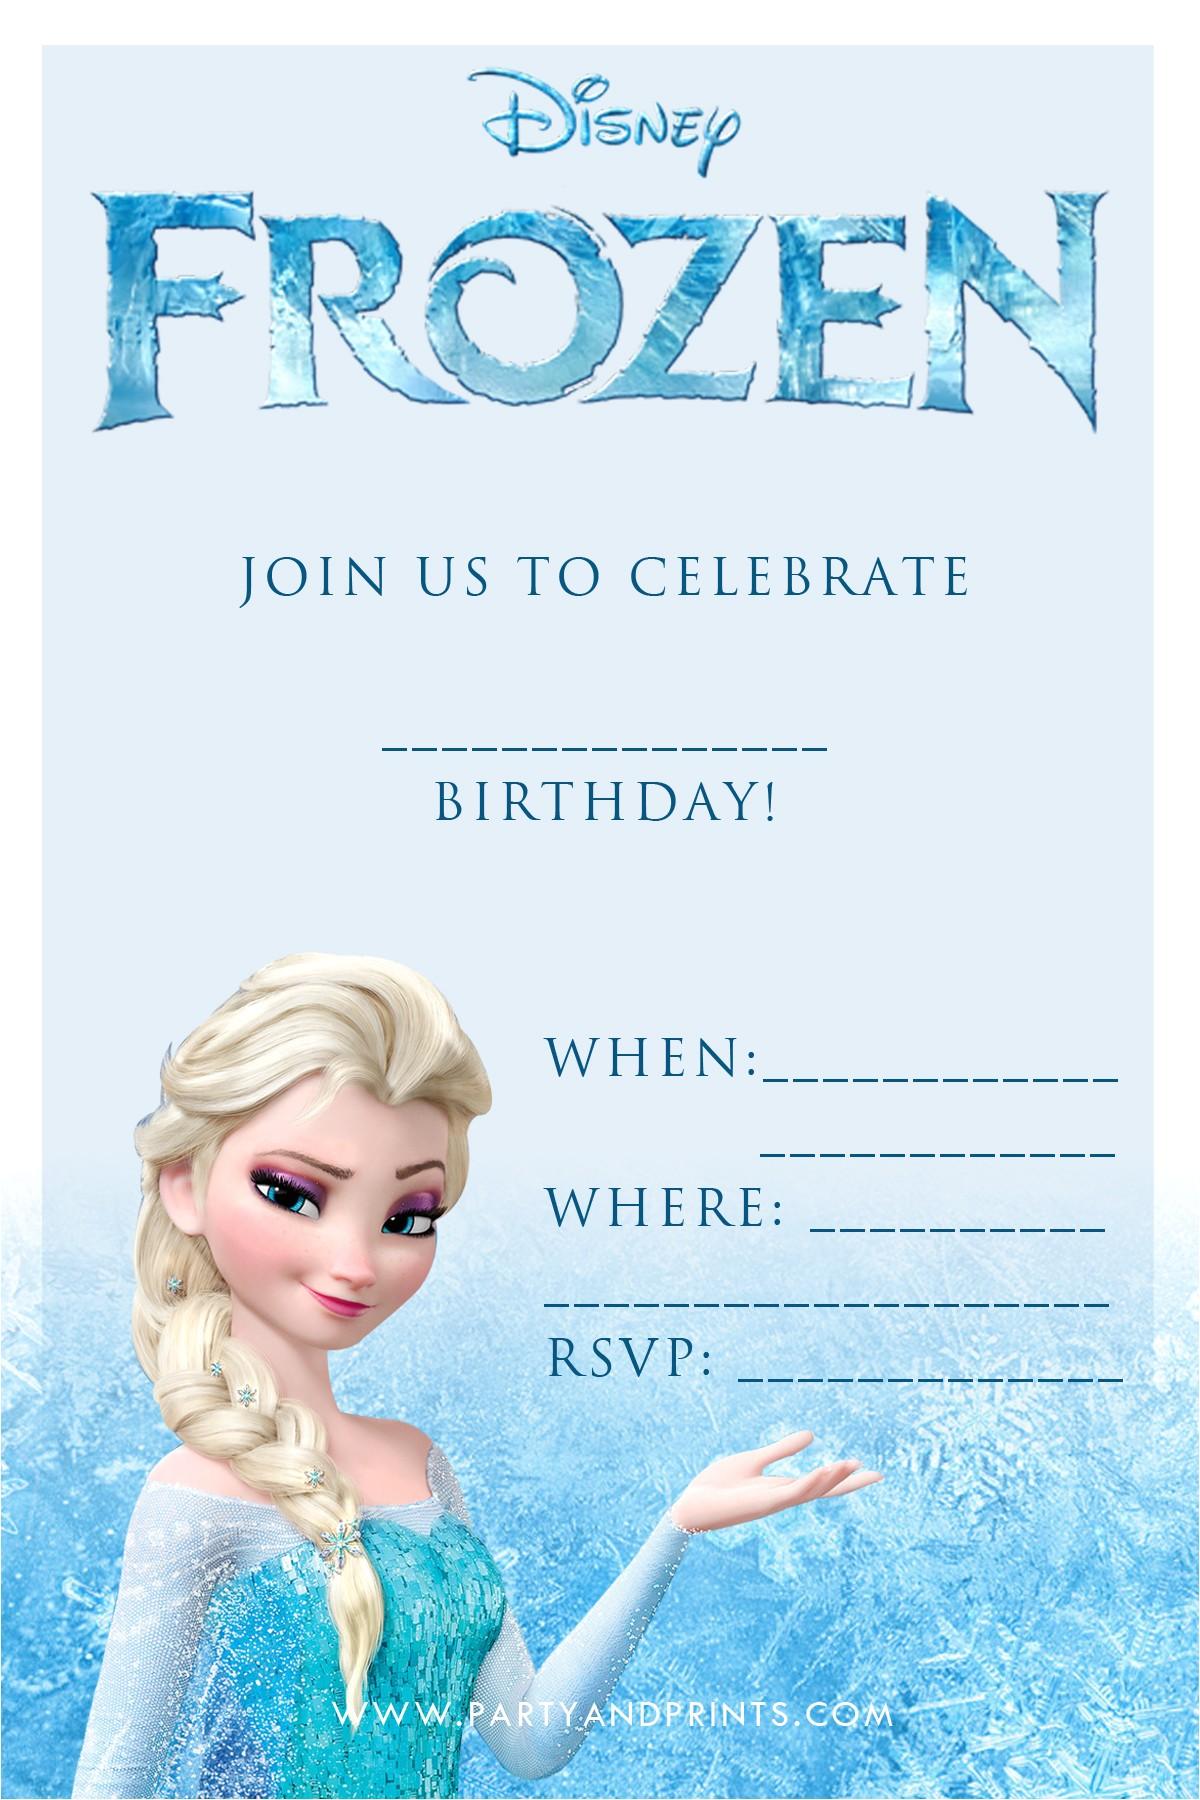 Frozen Birthday Party Invitations Printable 20 Frozen Birthday Party Ideas